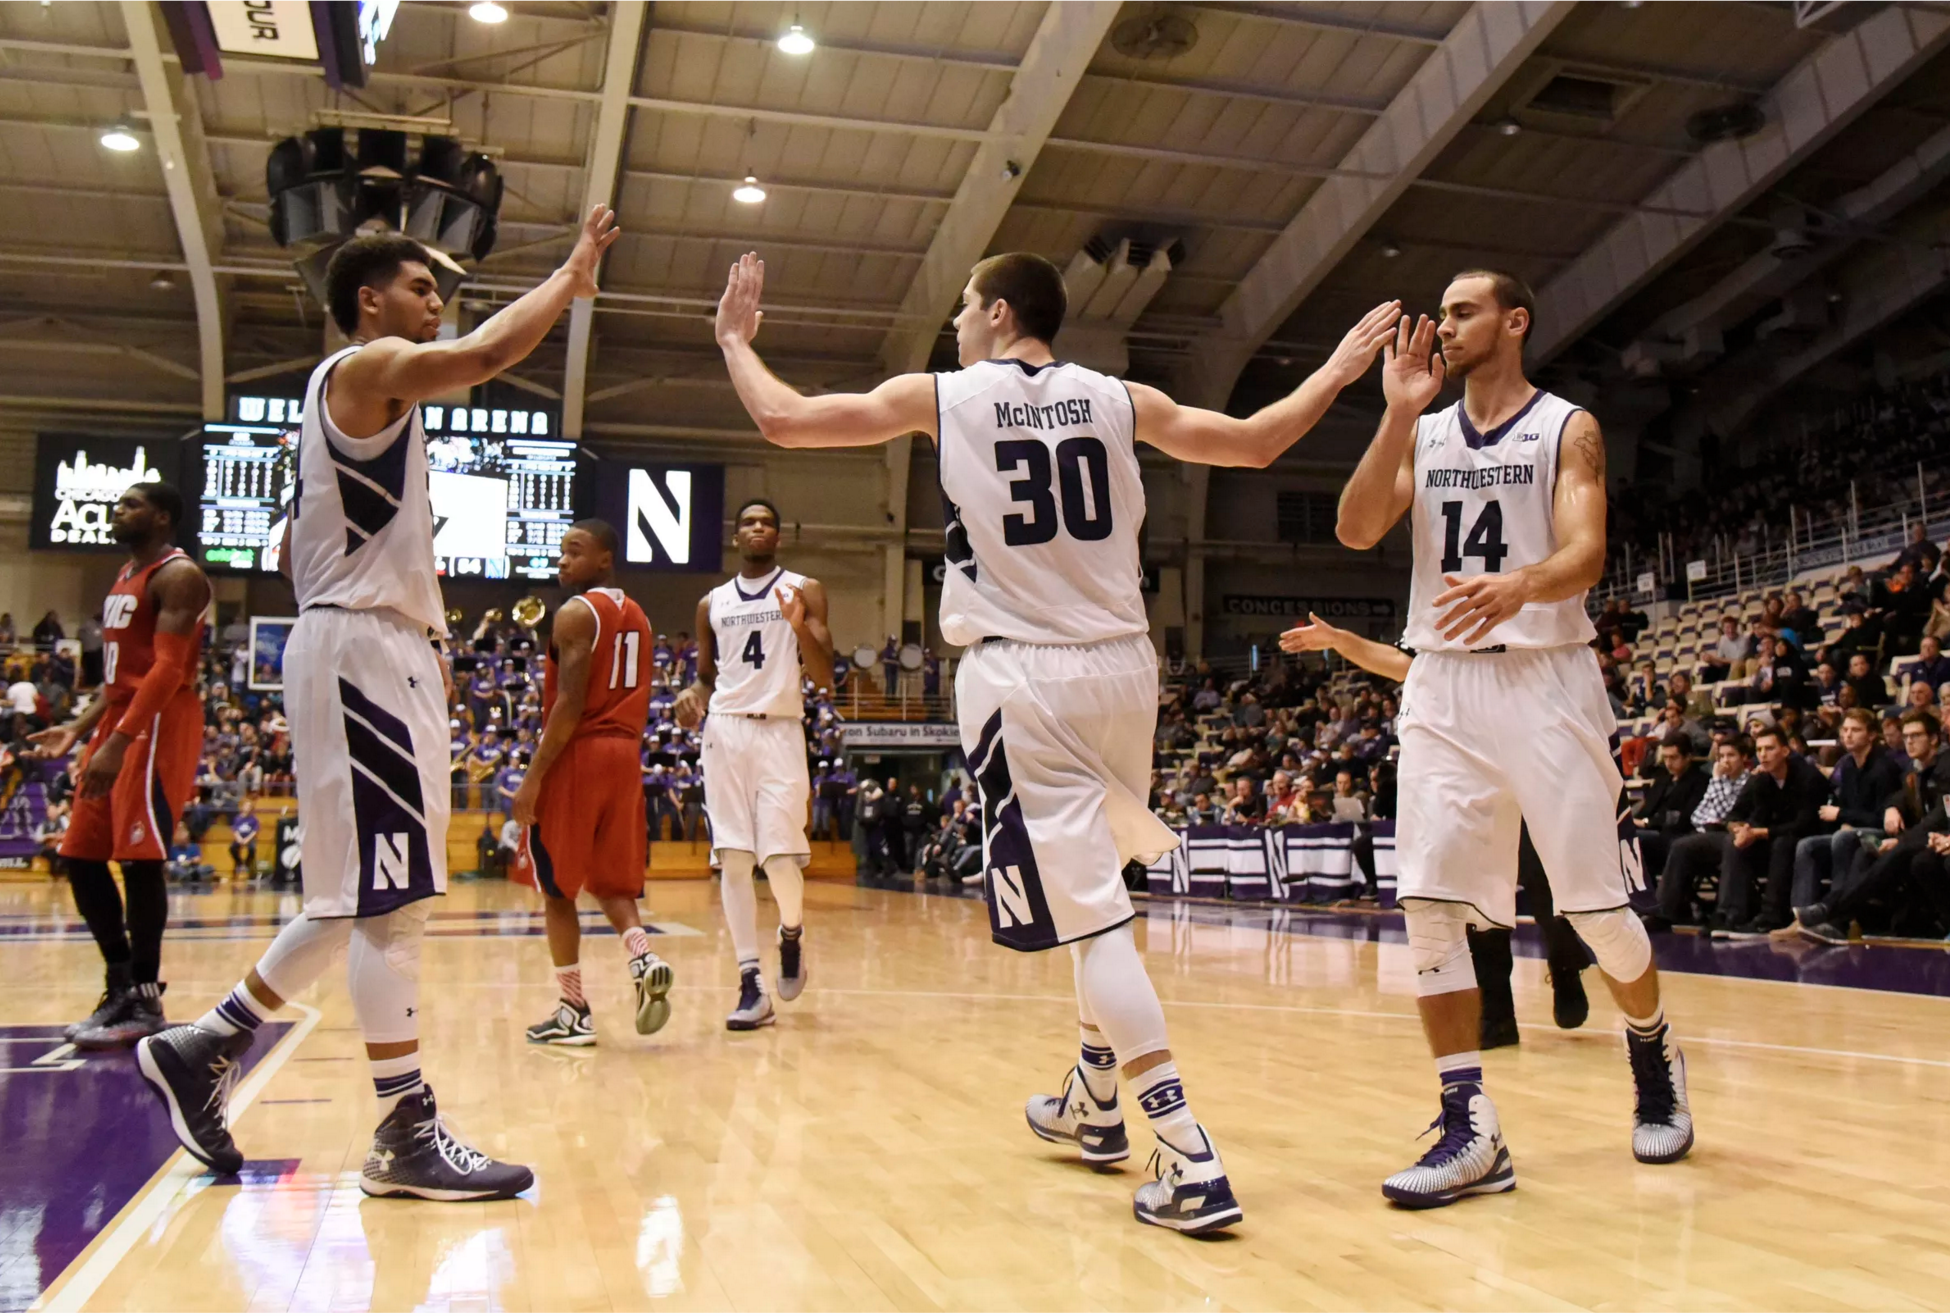 Photo Credit: David Banks/USA TODAY Sports